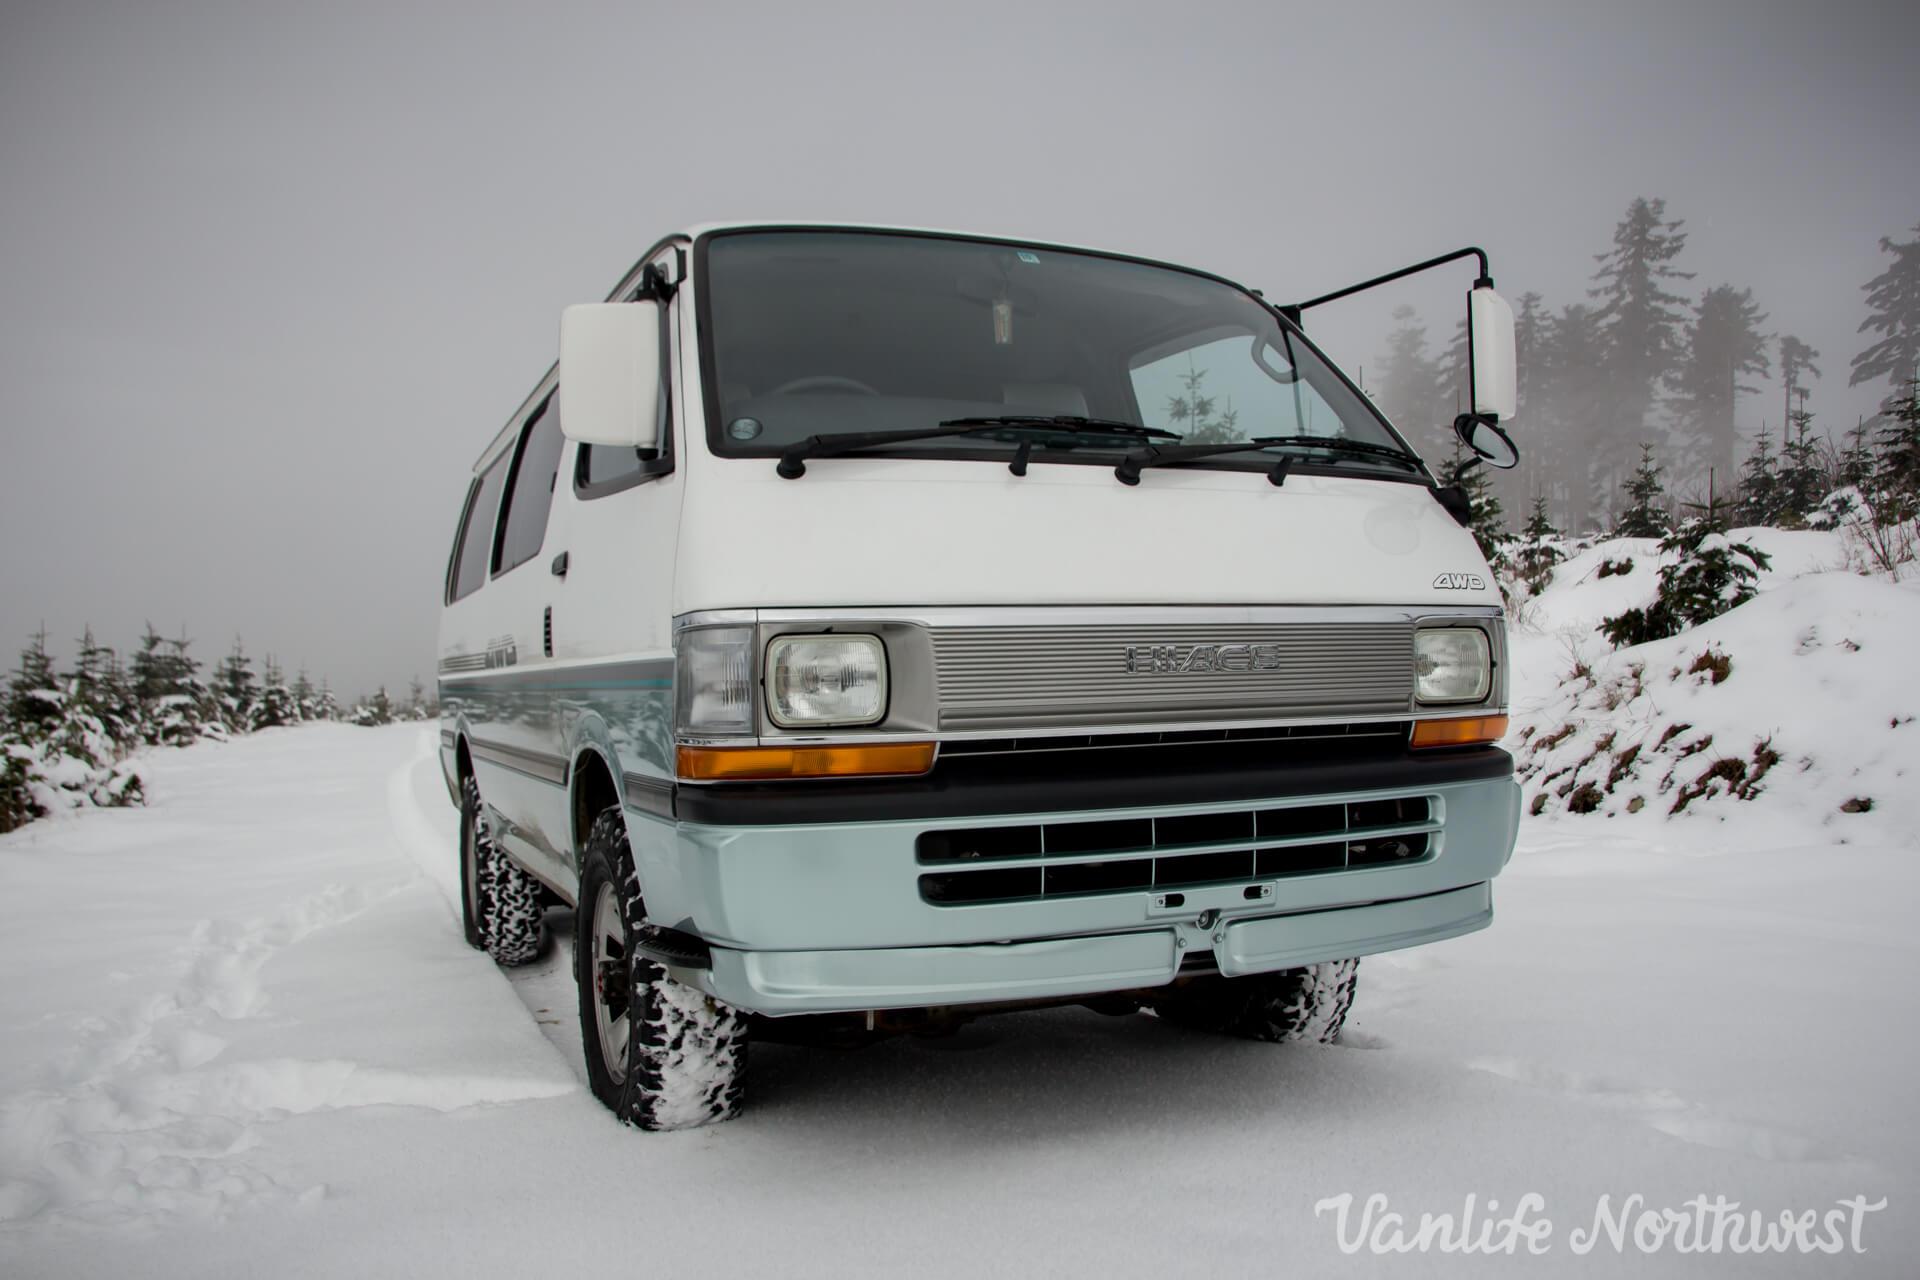 ToyotaHiaceLH119-JoeH-26.jpg